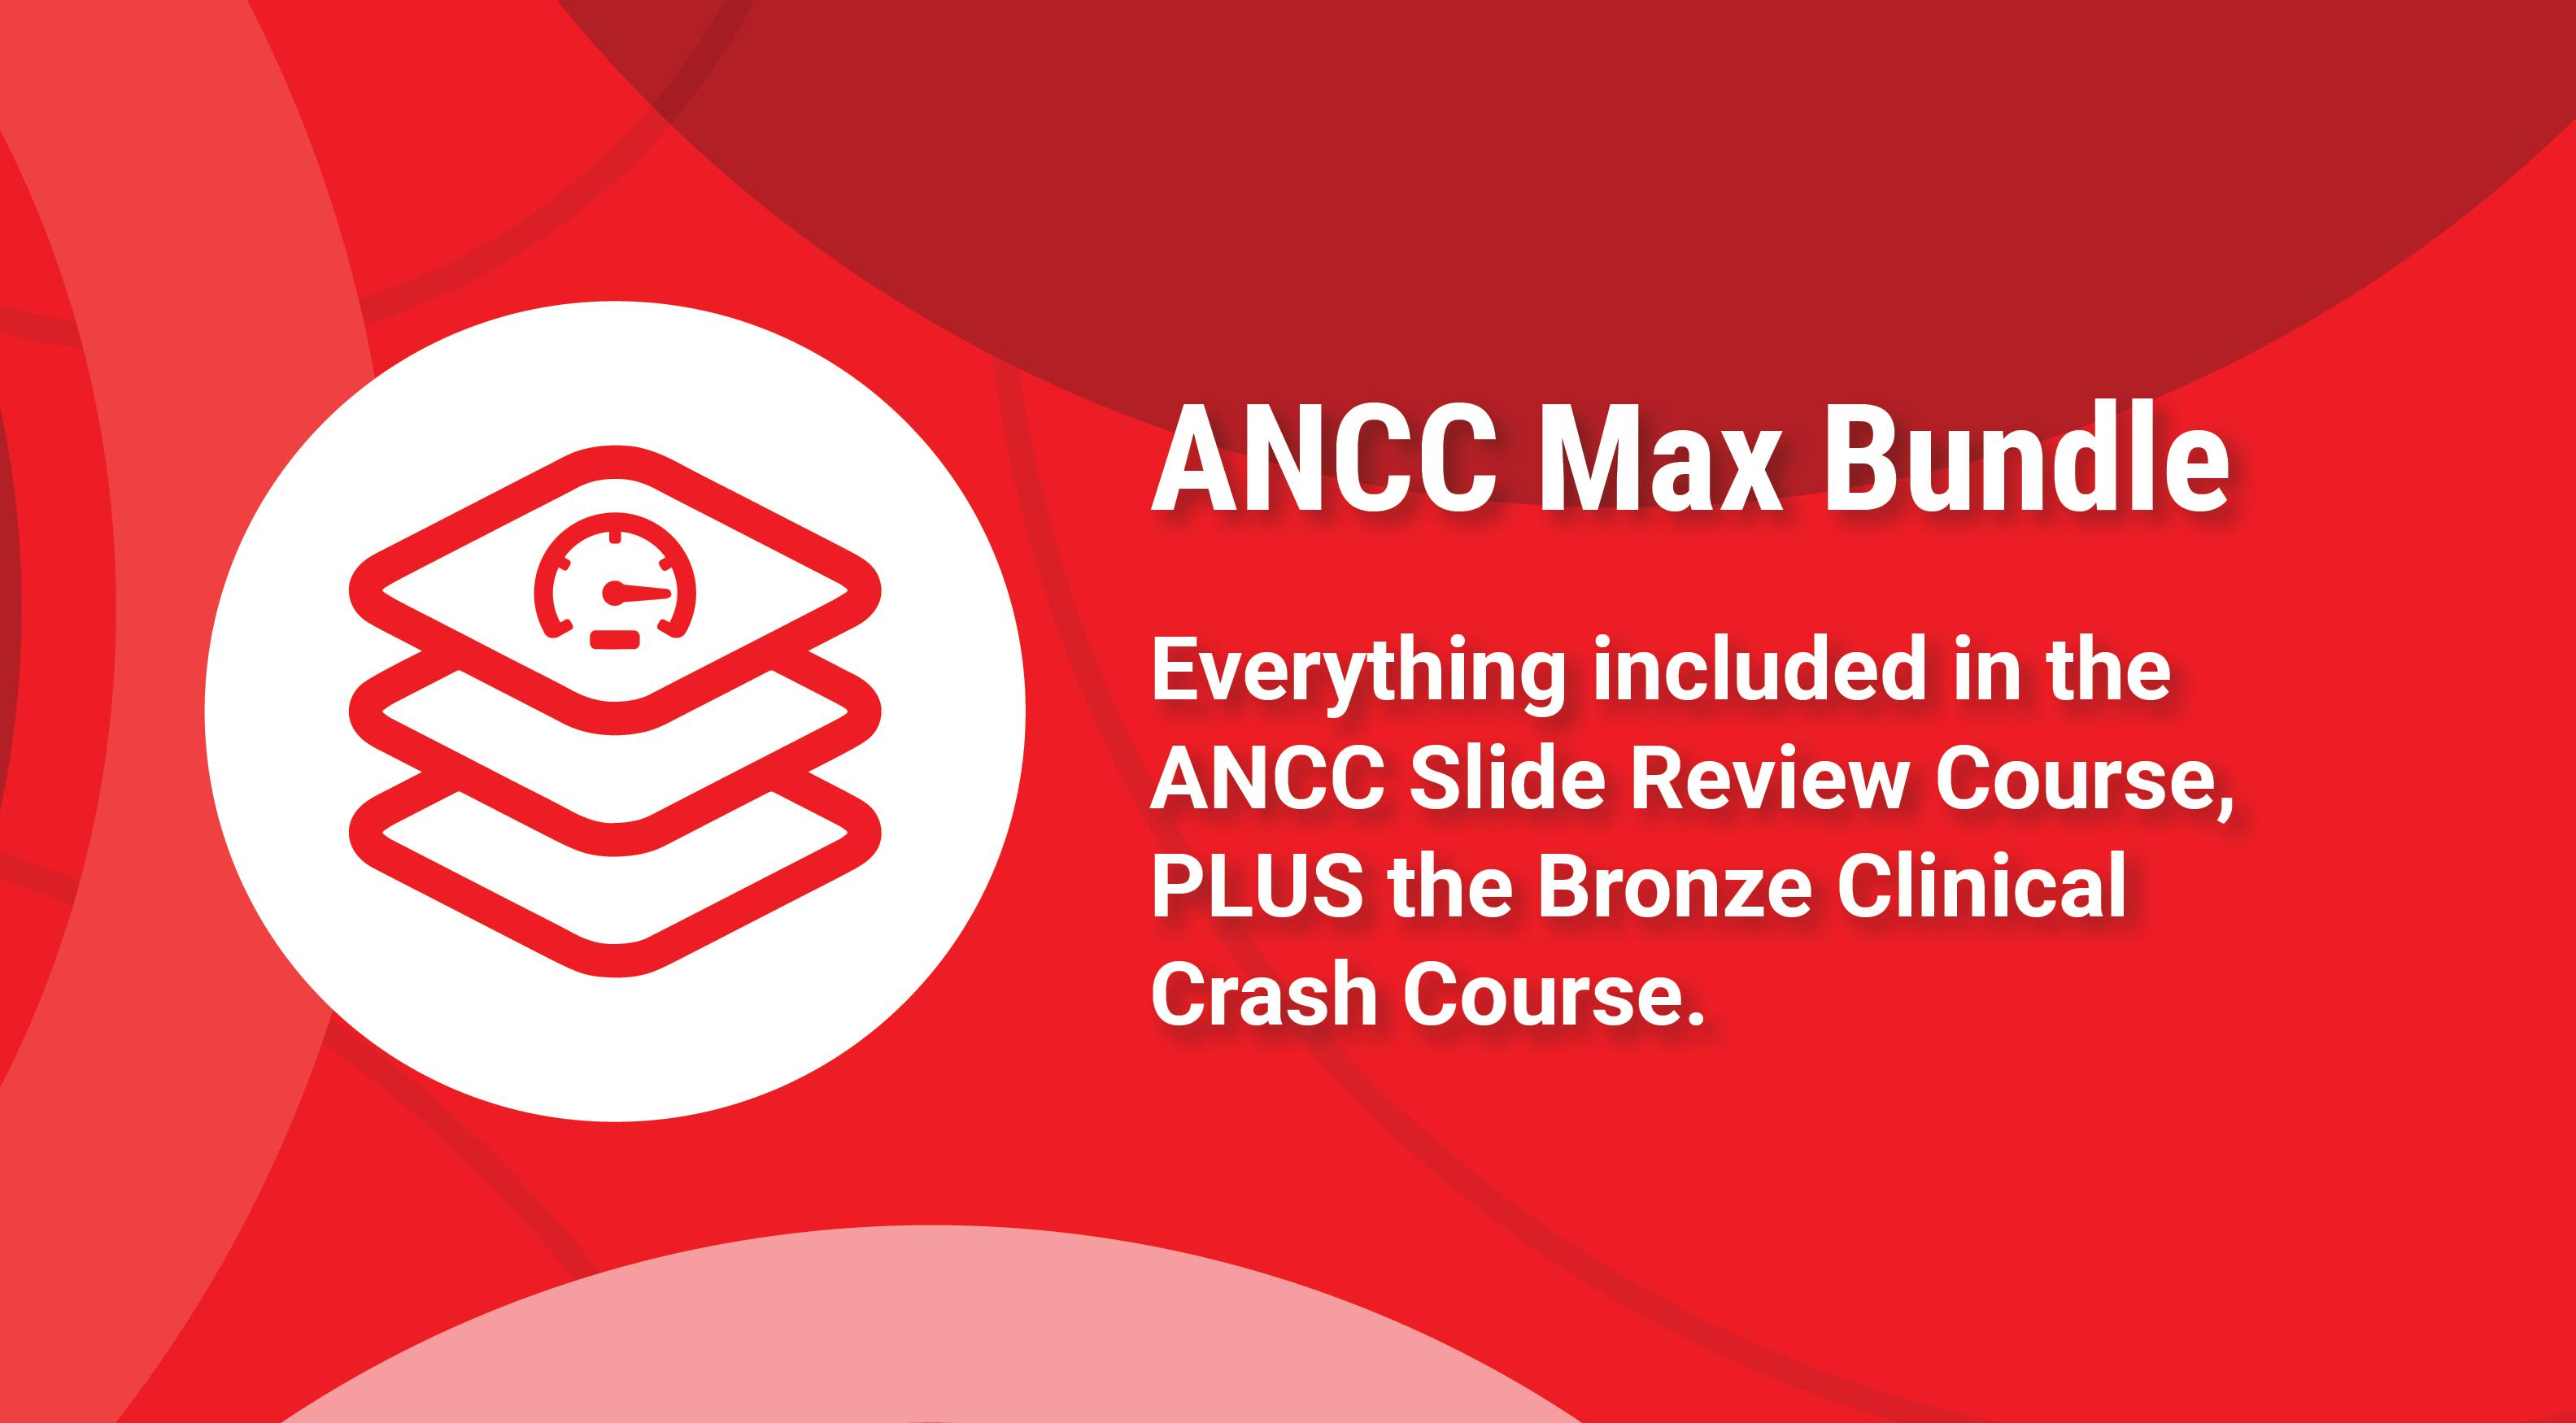 ANCC Max Bundle